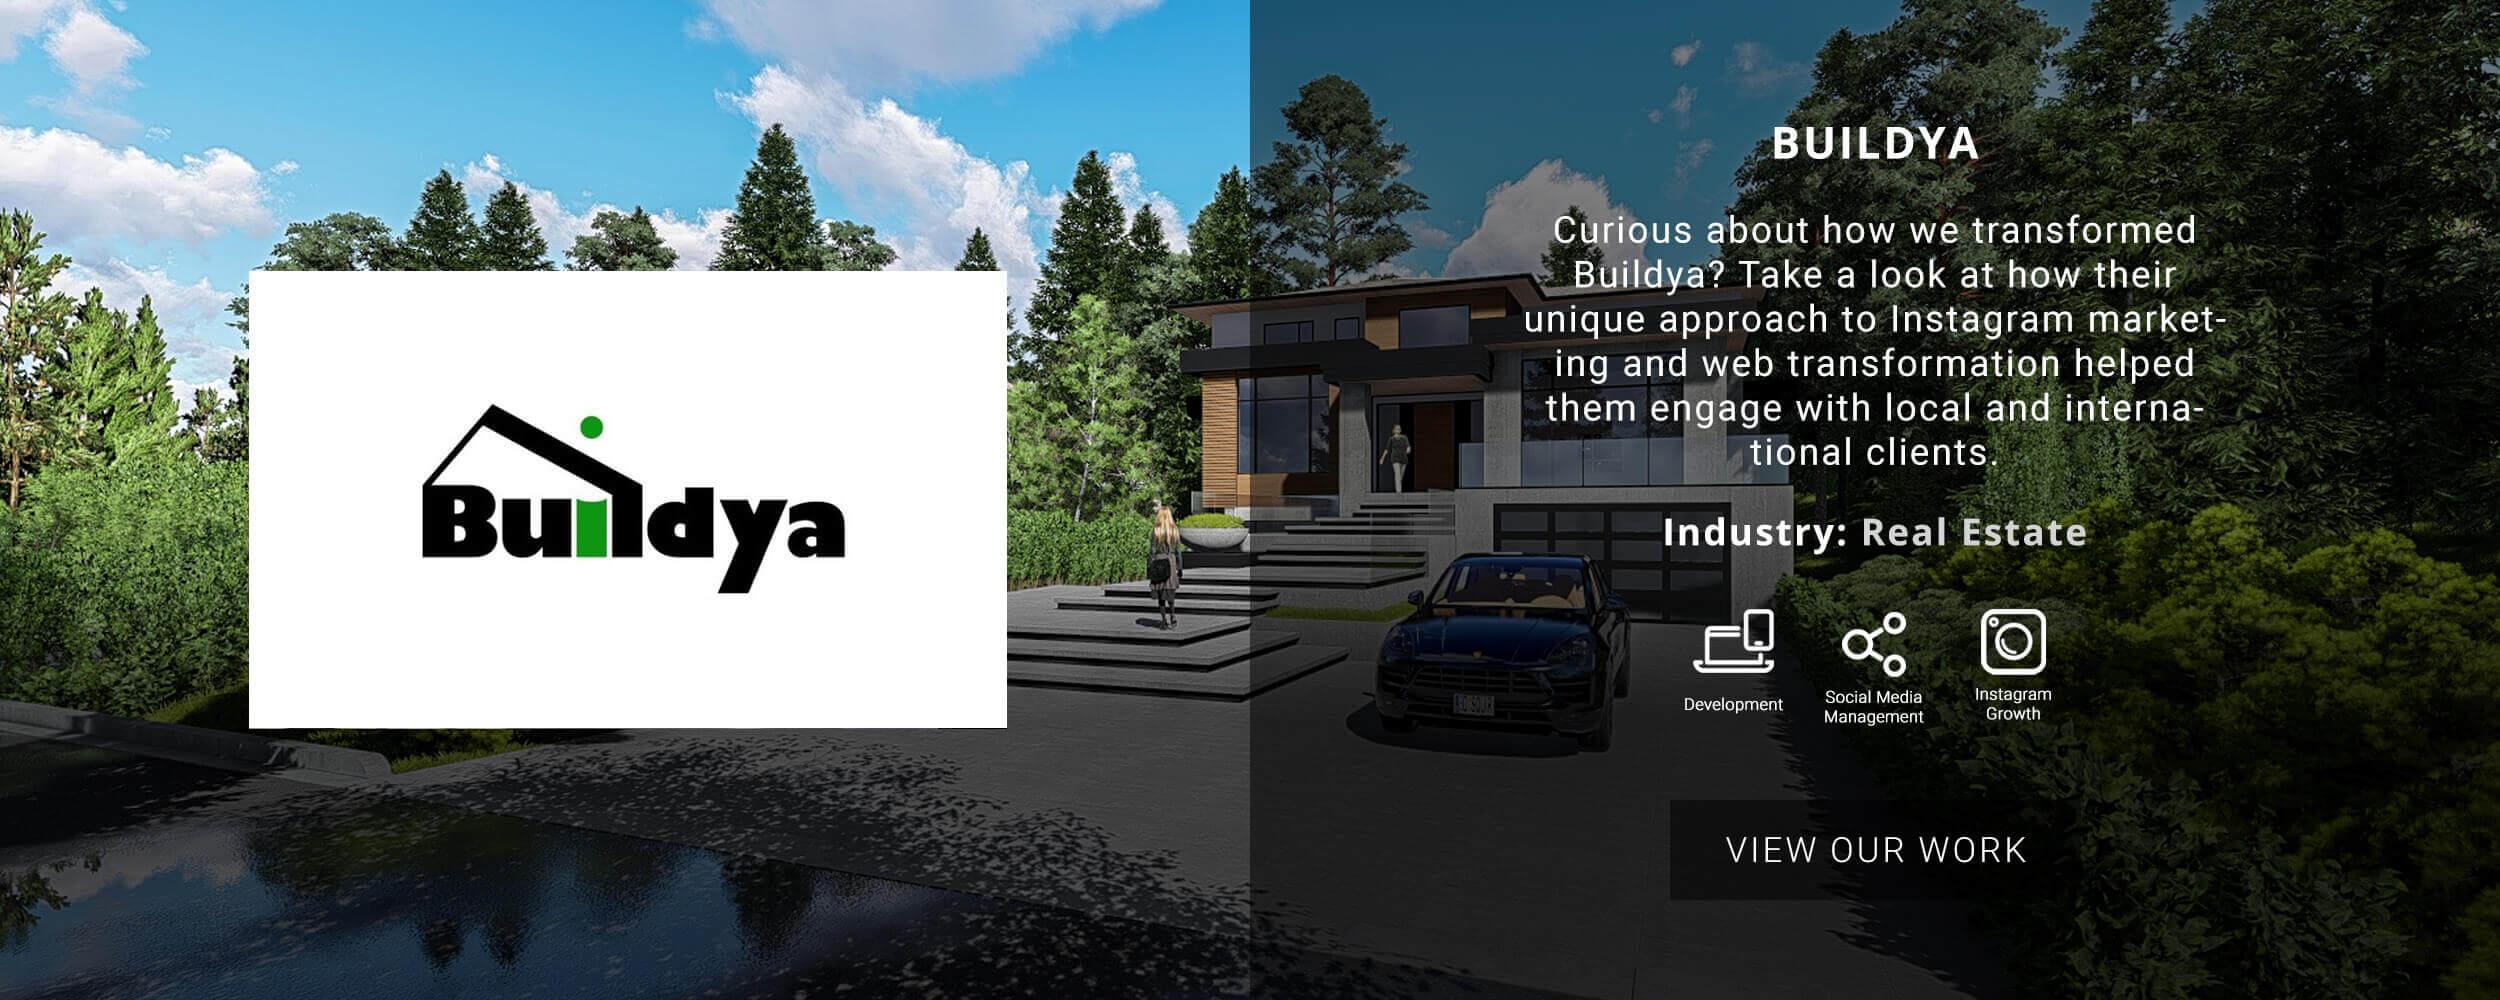 Buildya Case Study